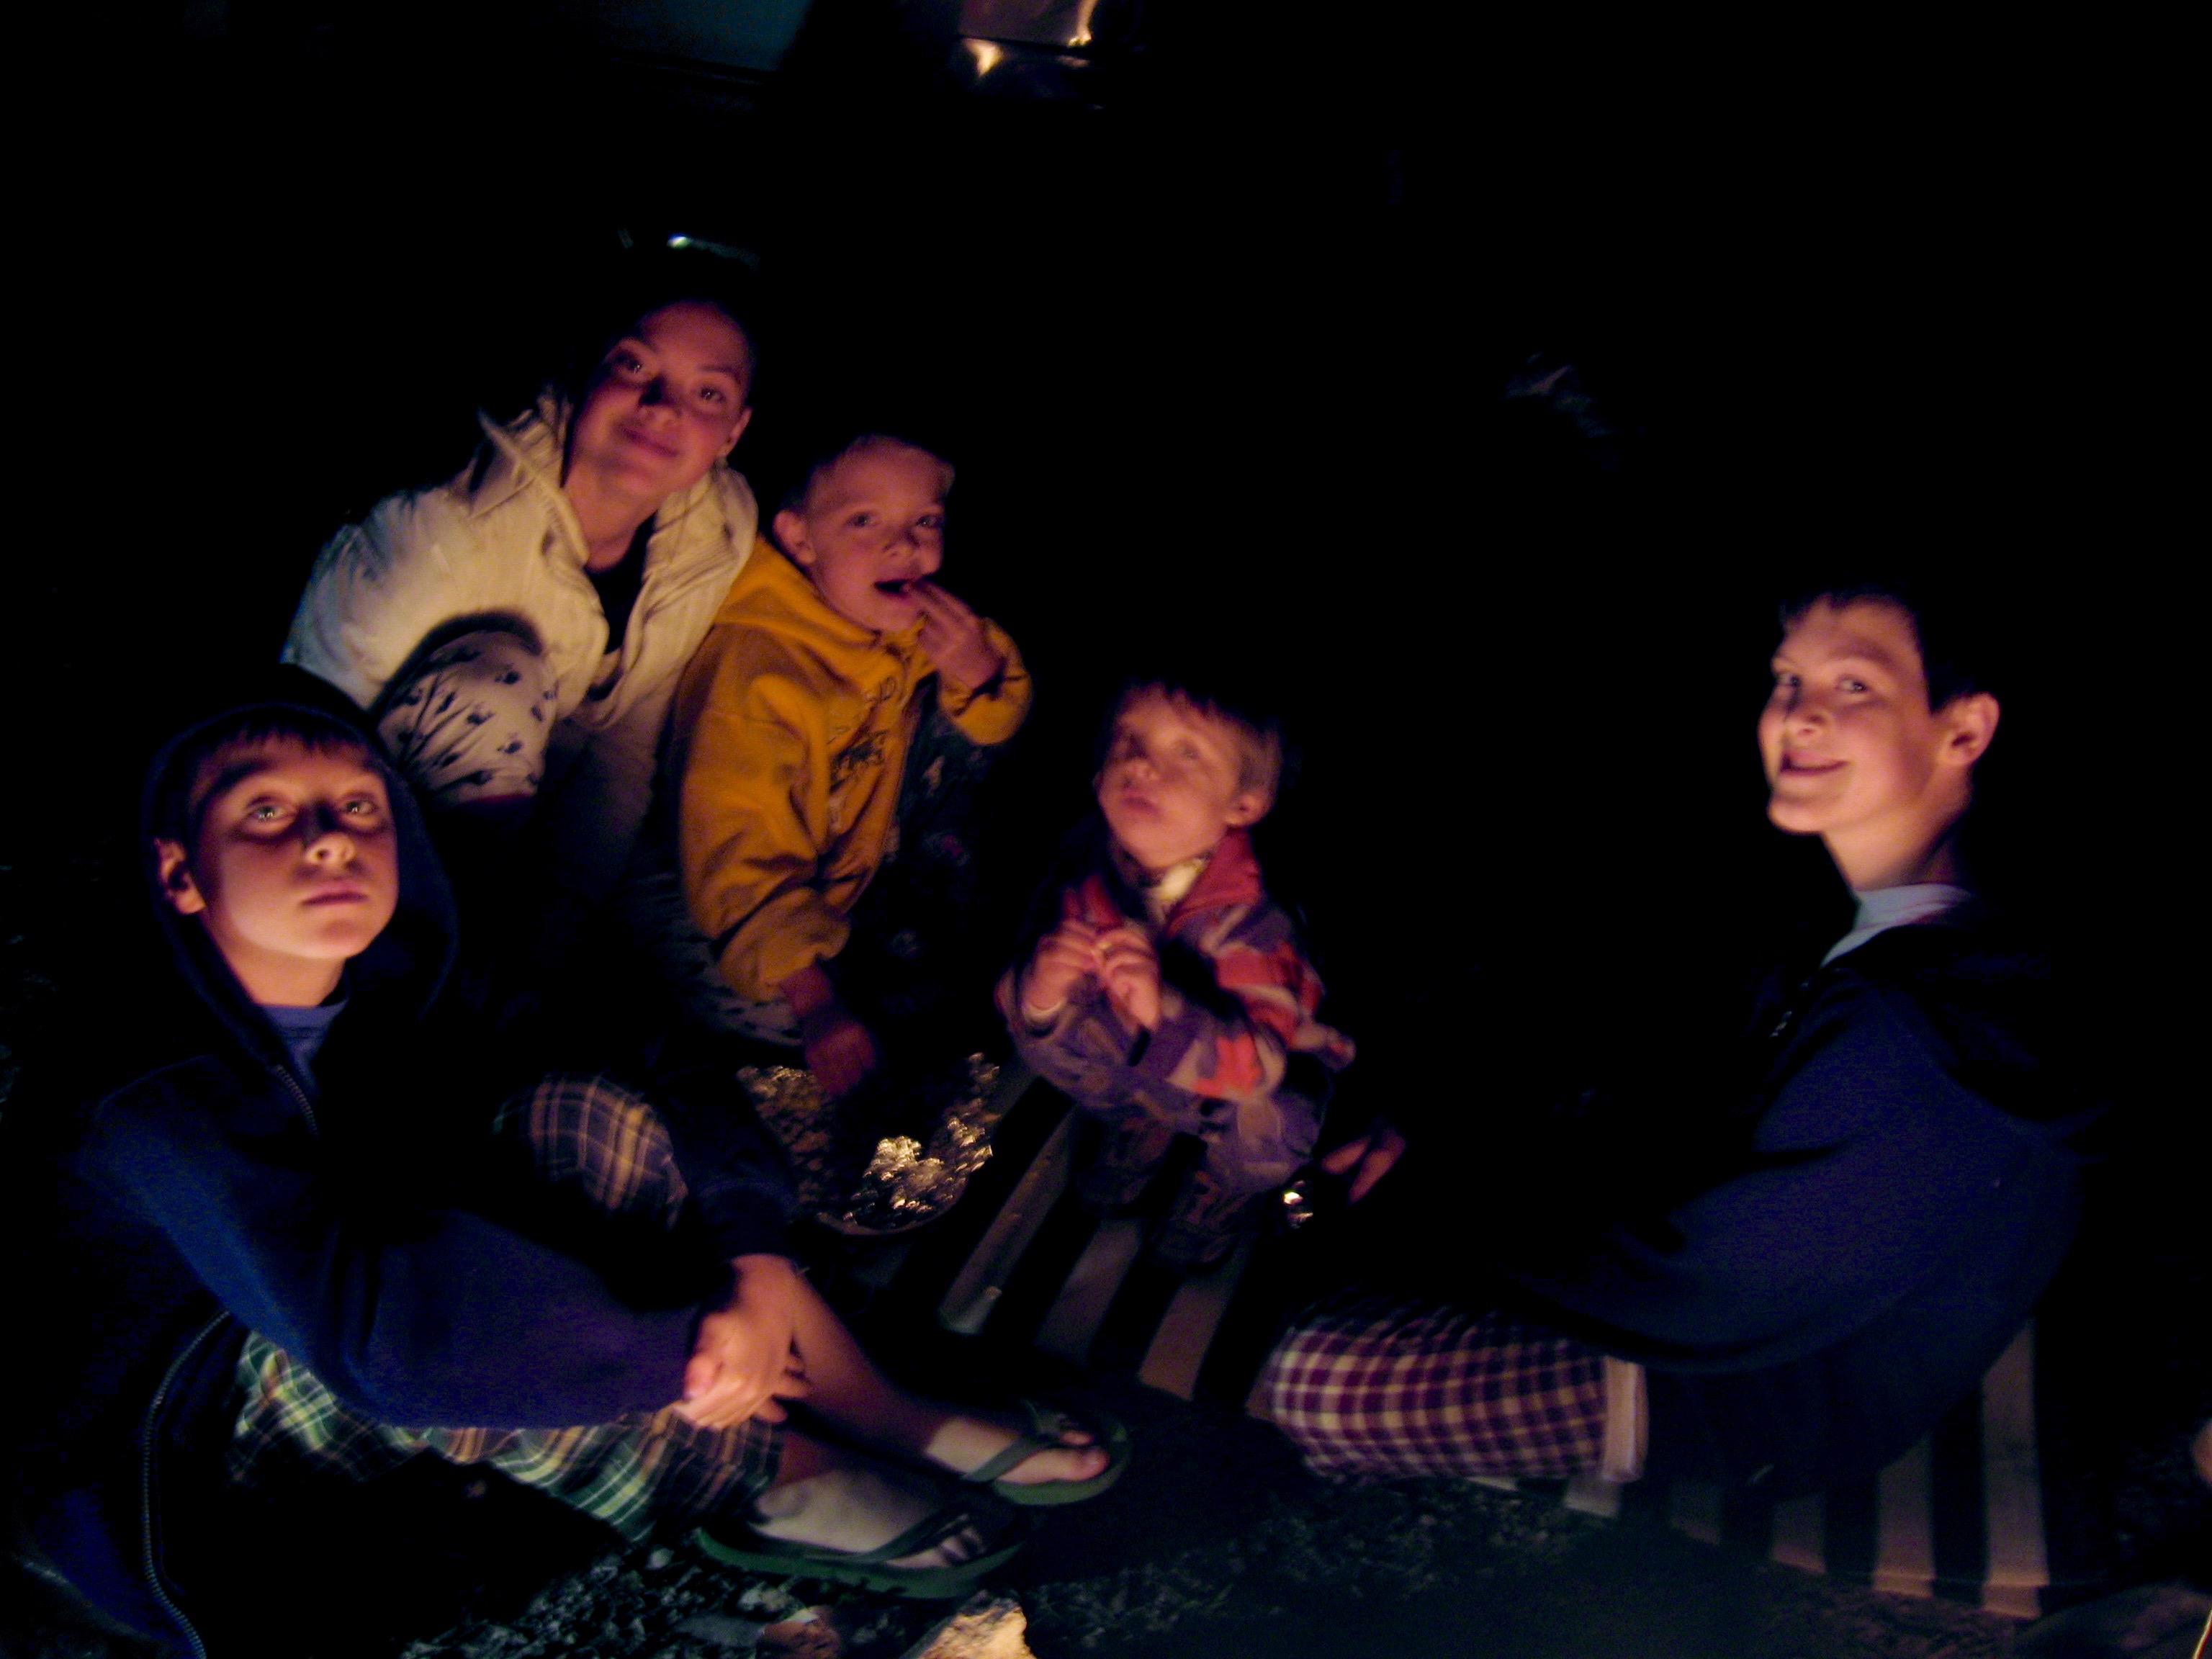 5 kids gathered around a campfire